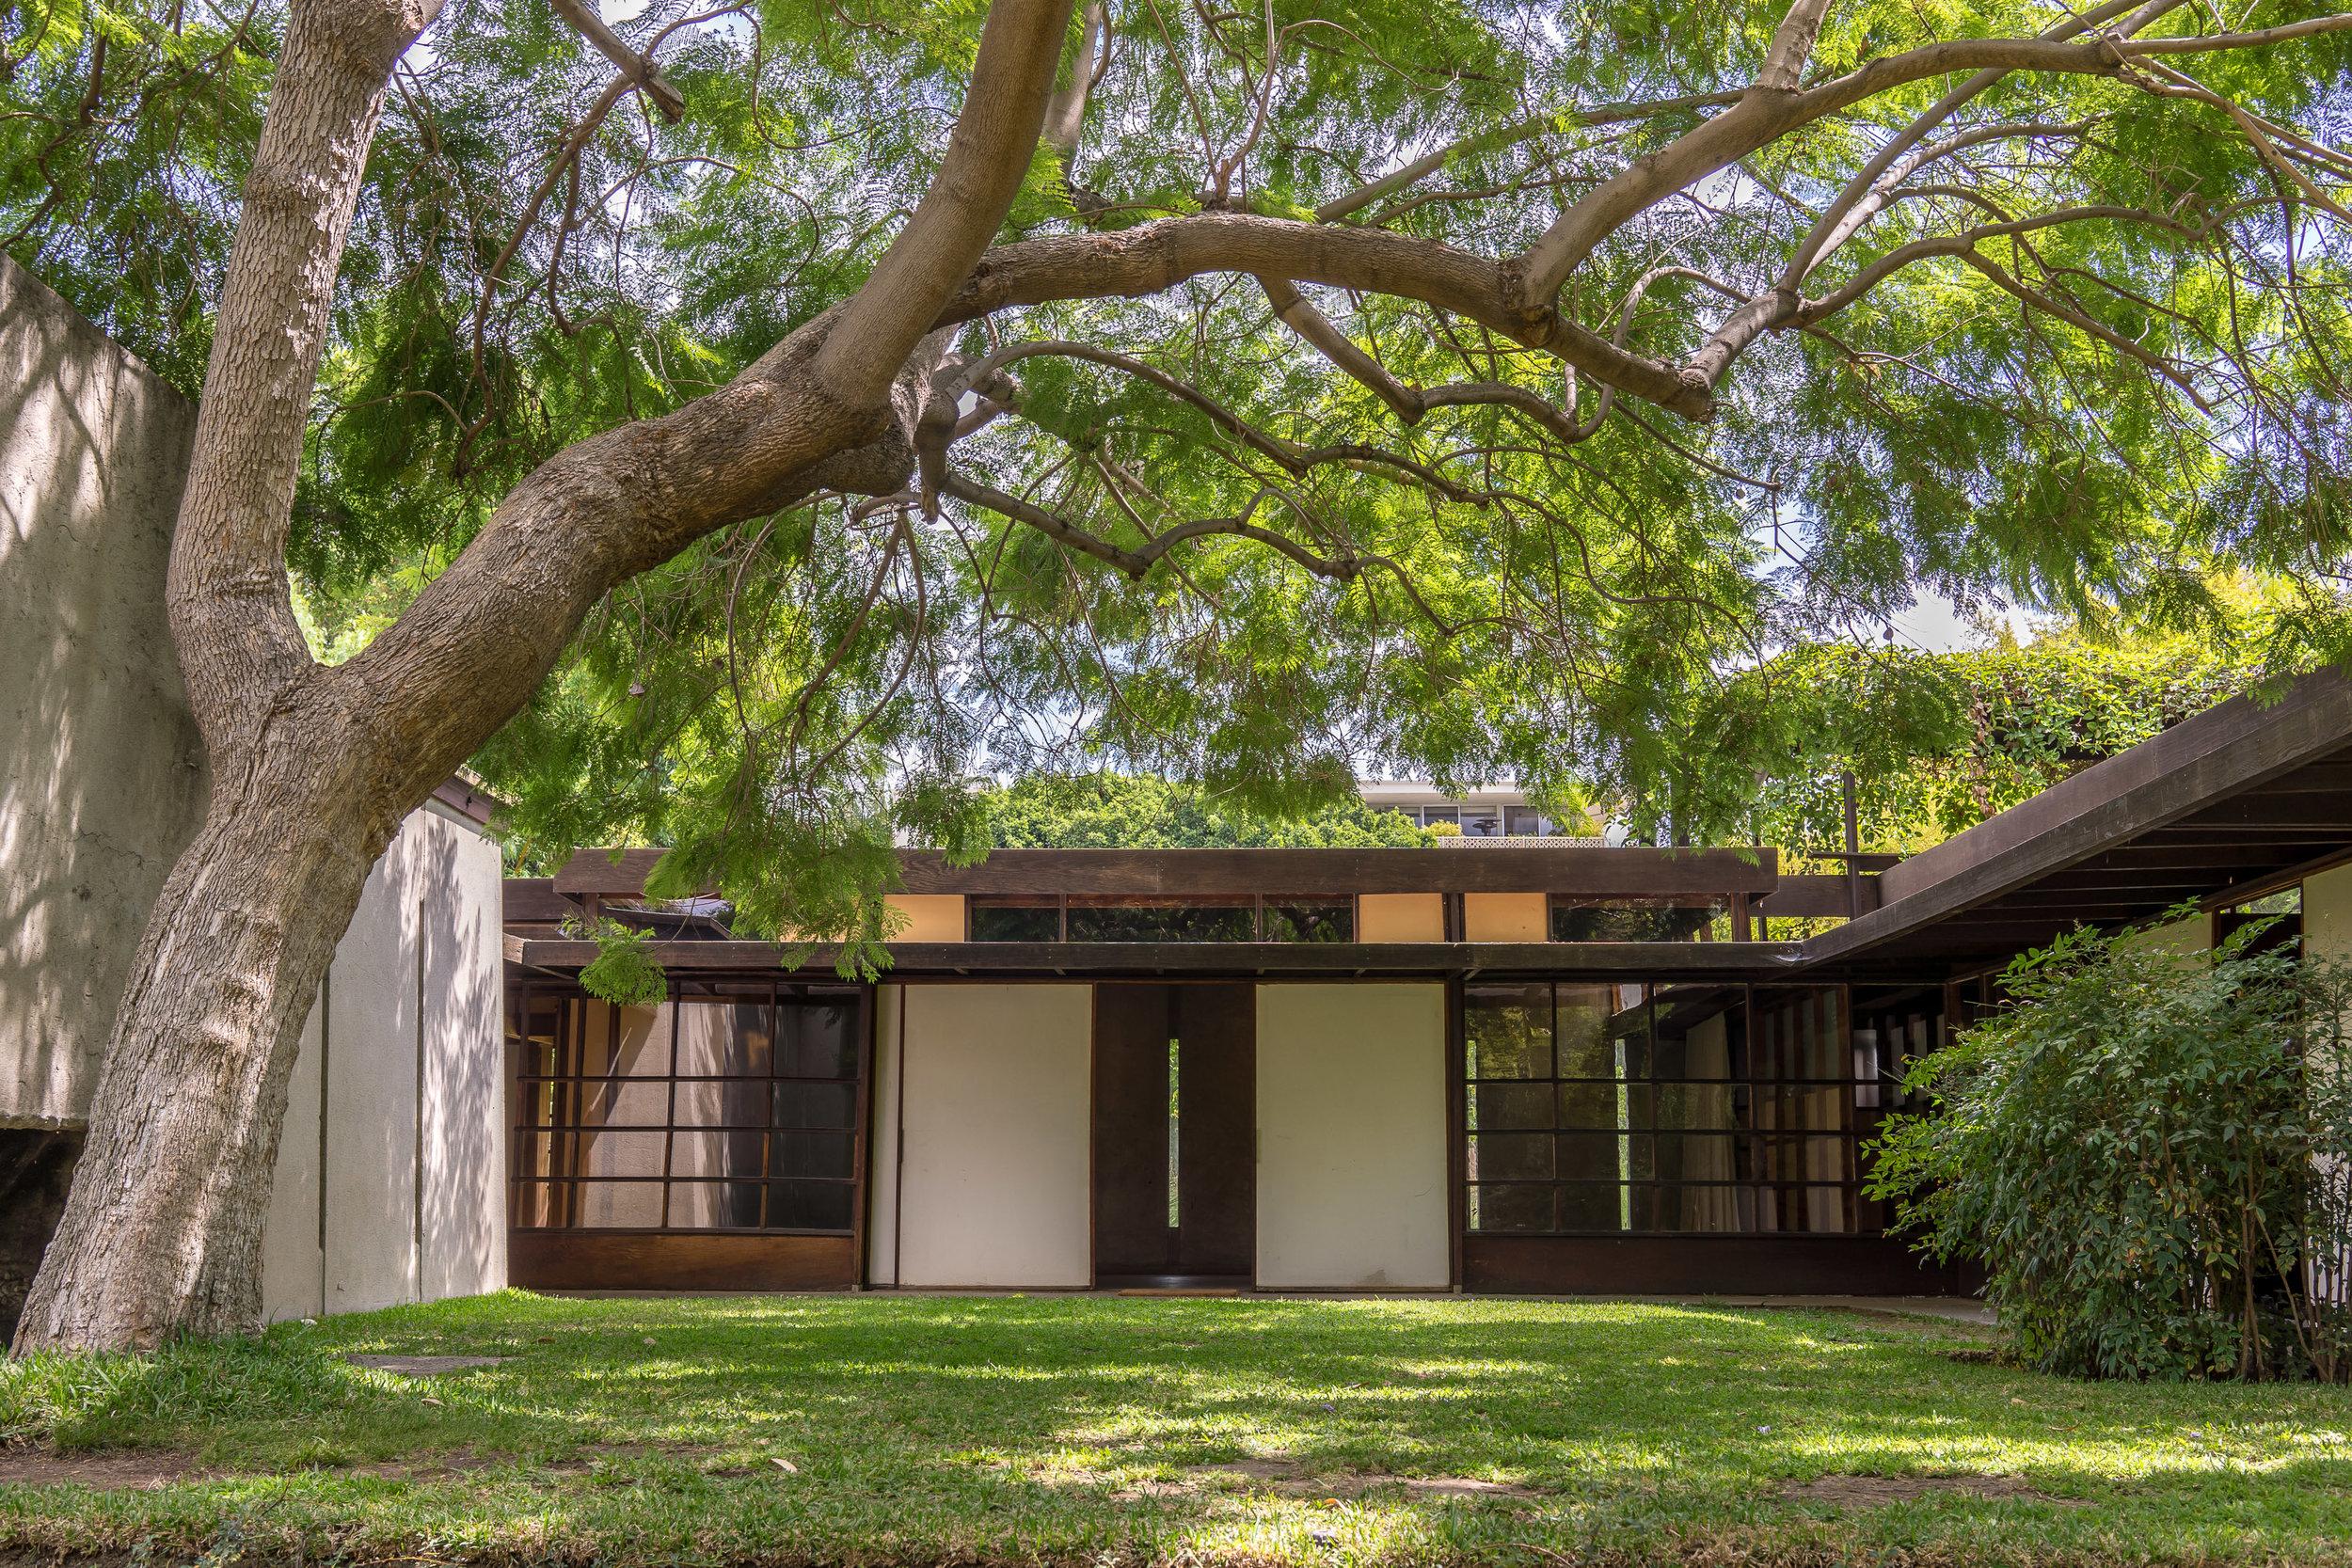 MYBELONGING-SCHINDLER-HOUSE-CASE-STUDY-LOS-ANGELES-ARCHITECTURE-PHOTOGRAPHY-10.jpg